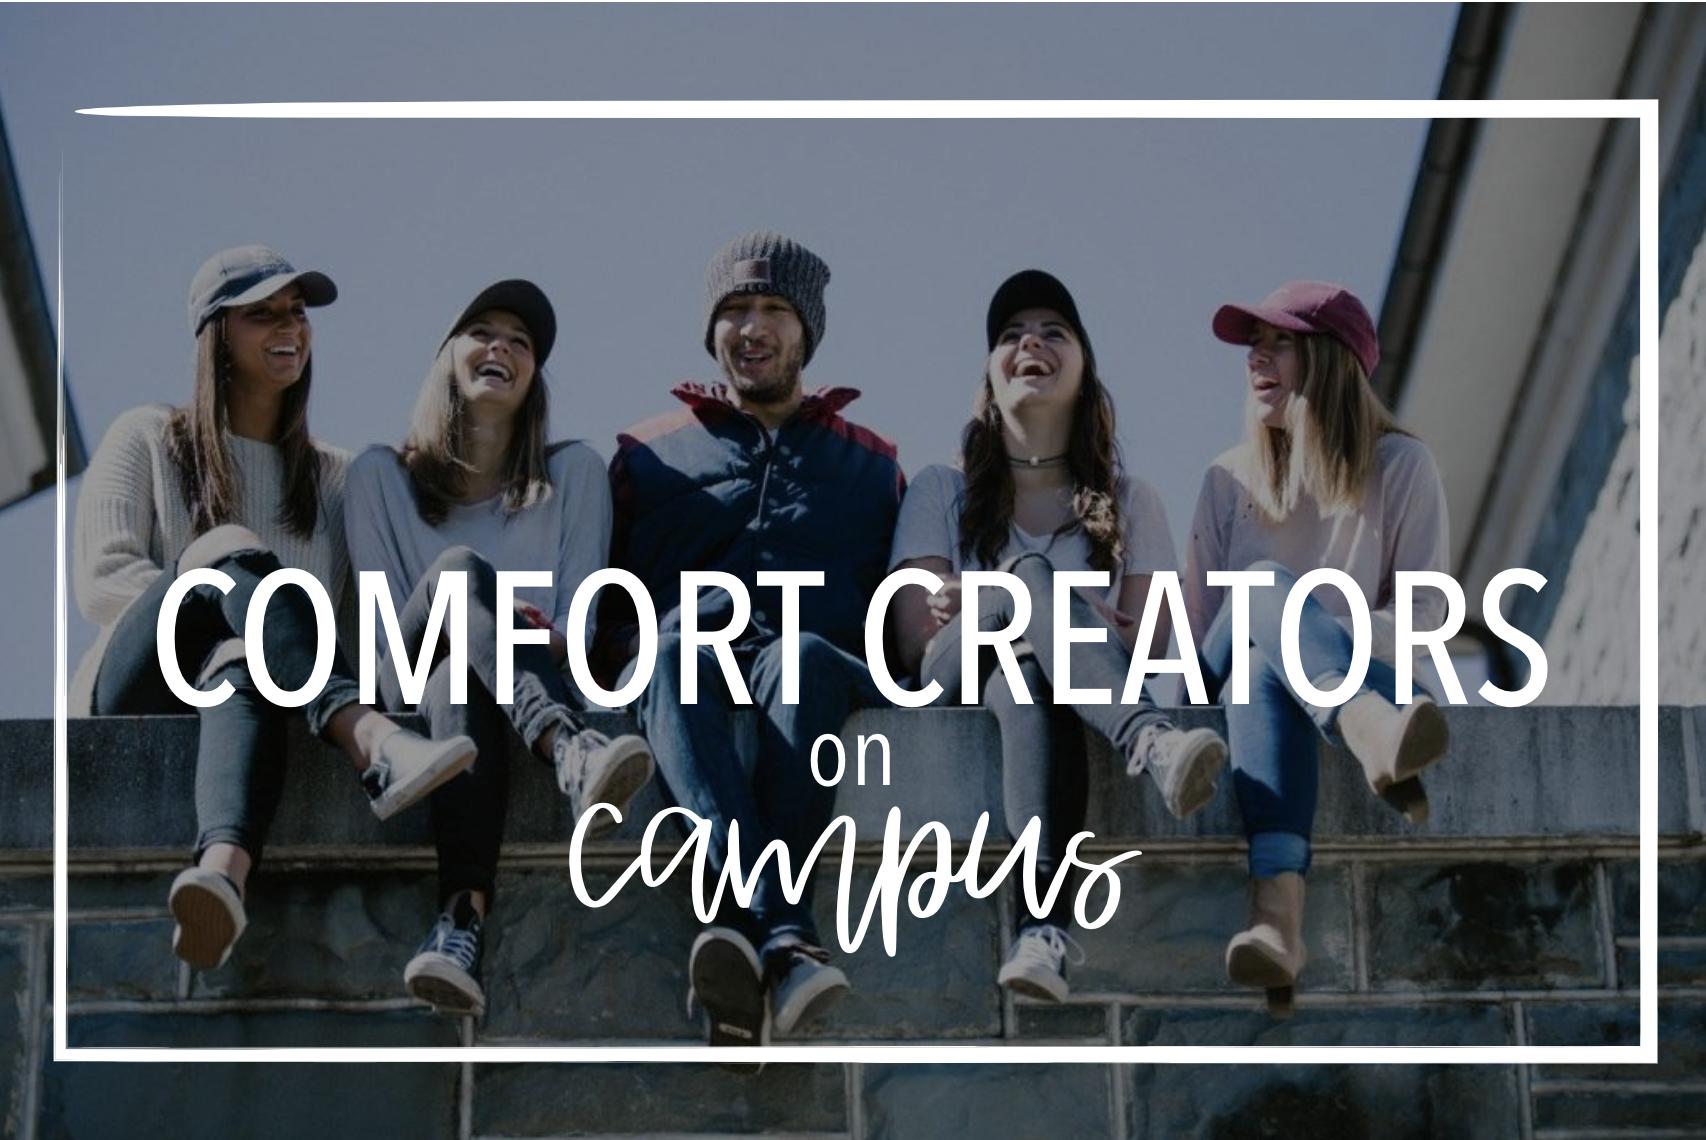 Comfort Creators on Campus .png